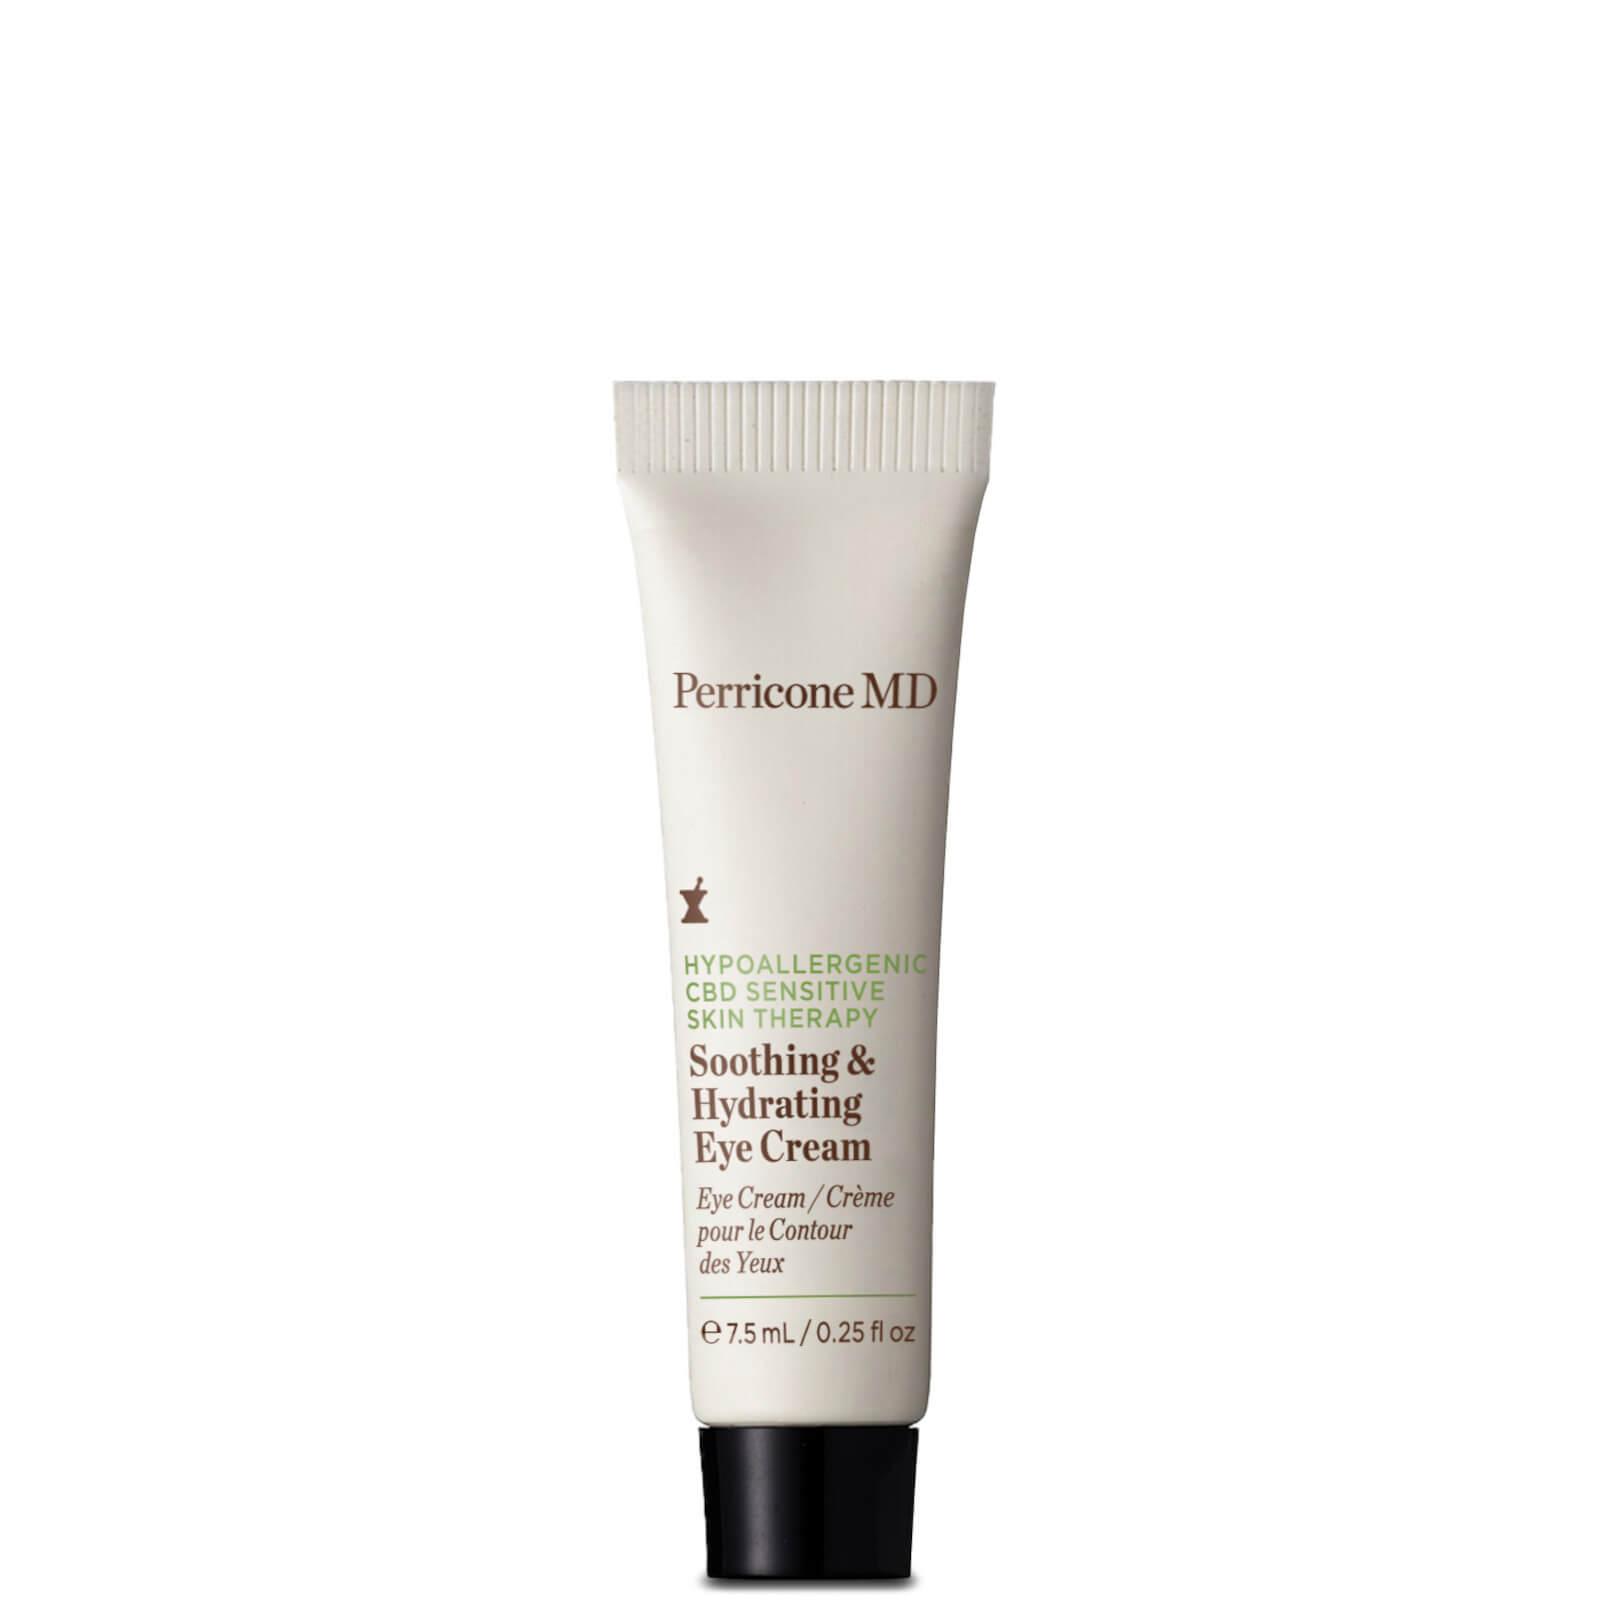 Hypoallergenic CBD Sensitive Skin Therapy Soothing & Hydrating Eye Cream (.25 oz)